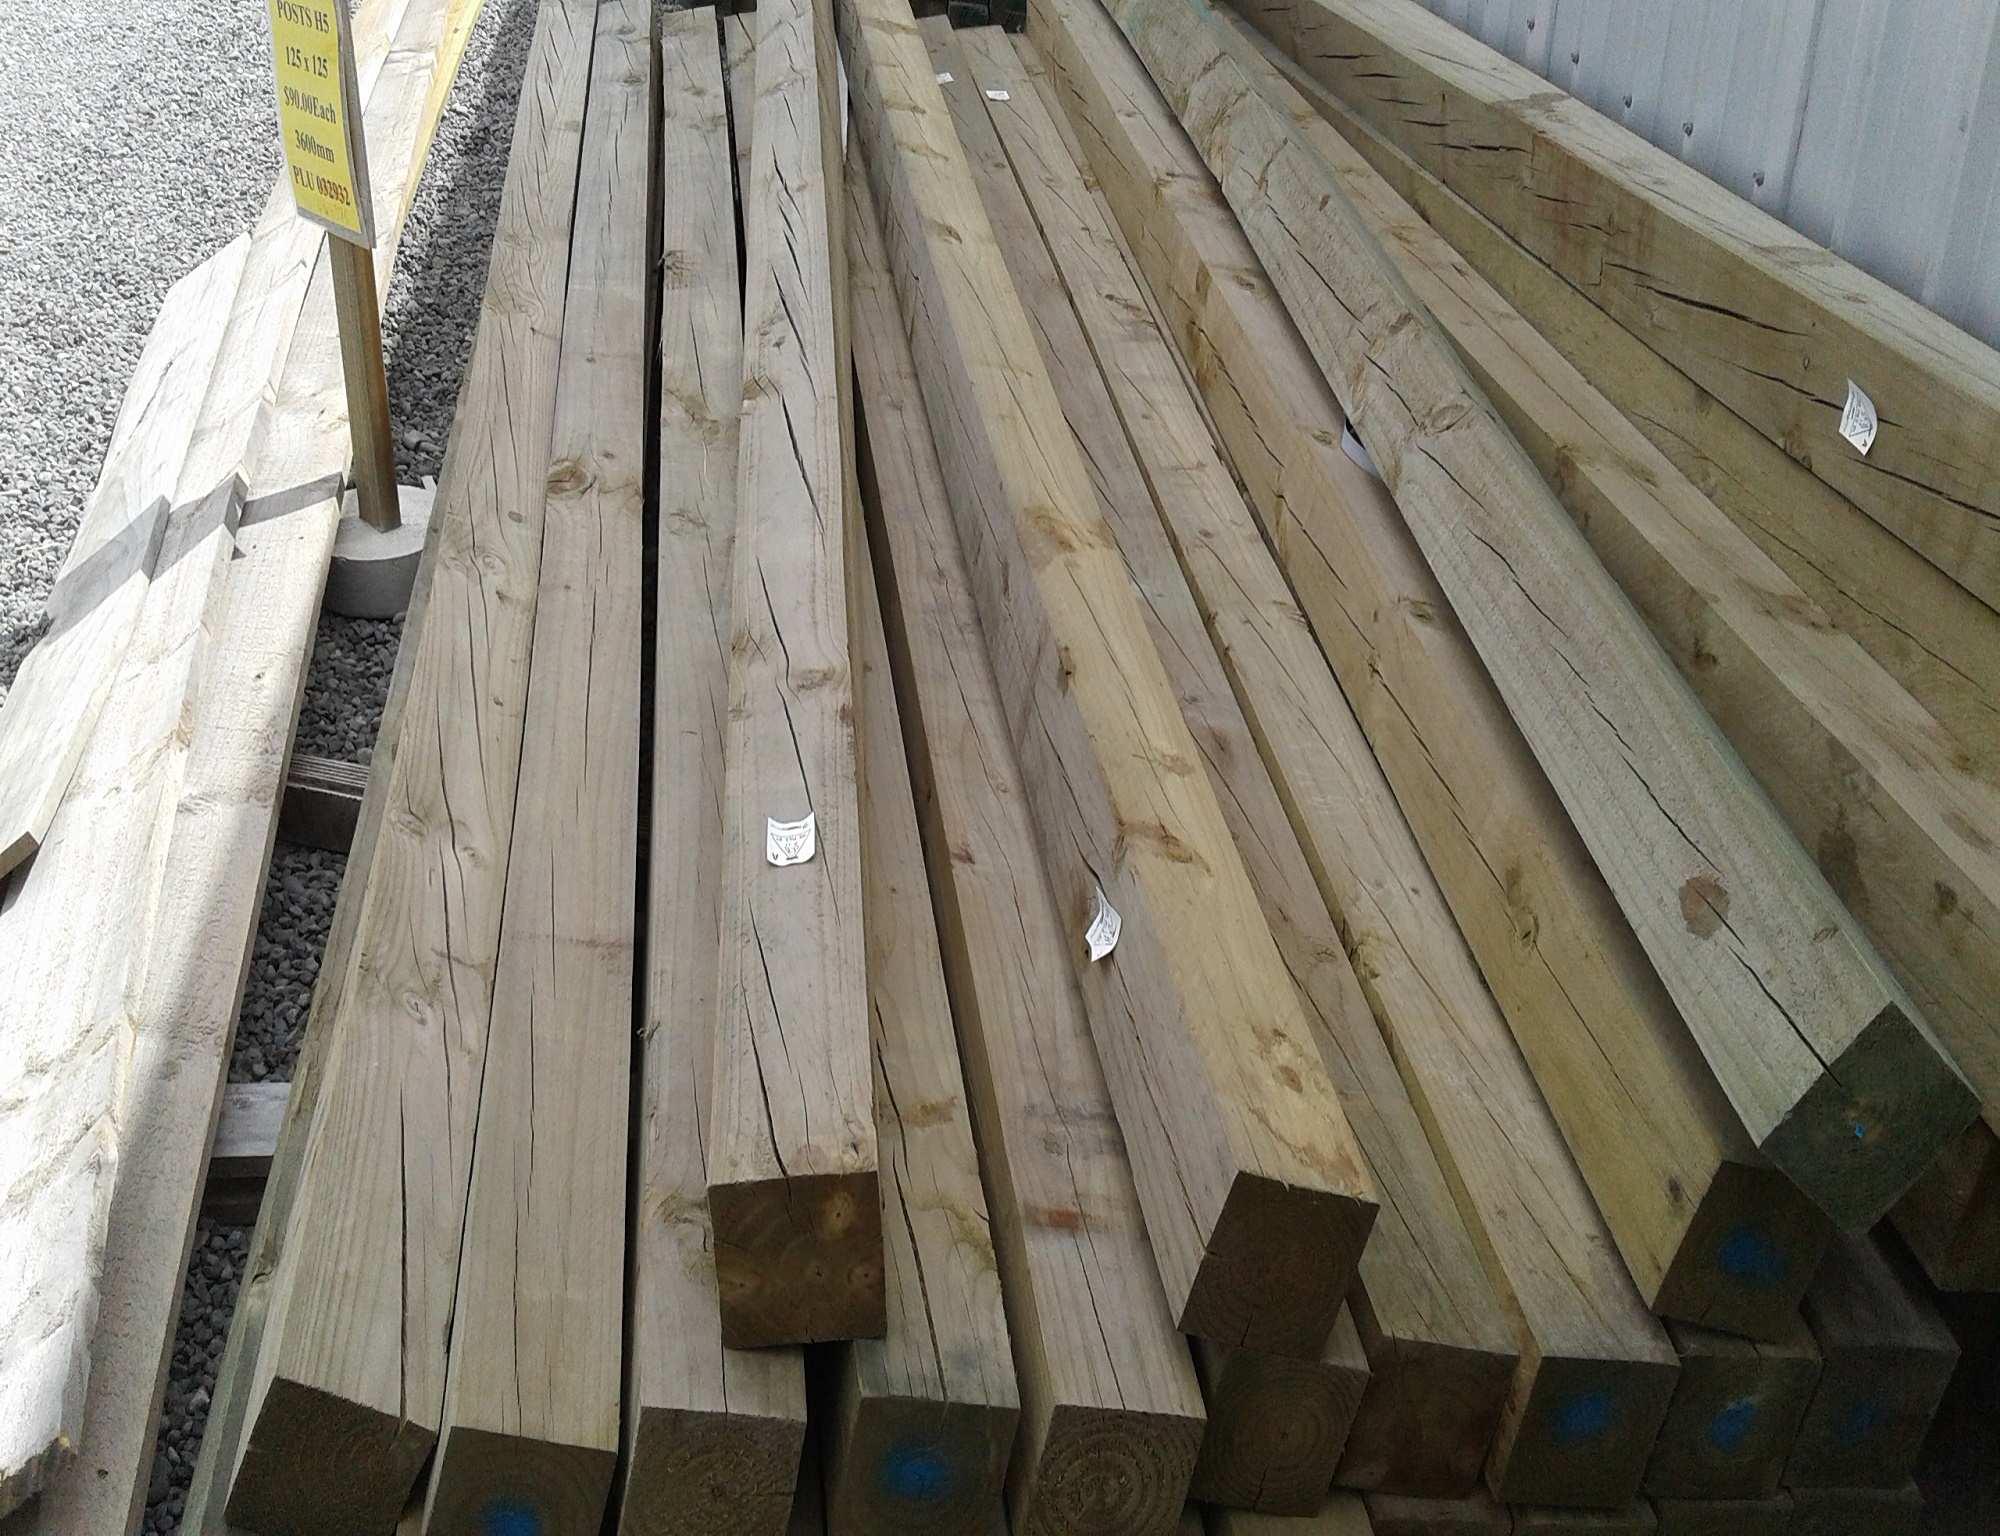 Pine Roughsawn 100 X 100mm H4 Treated New Musgroves Ltd